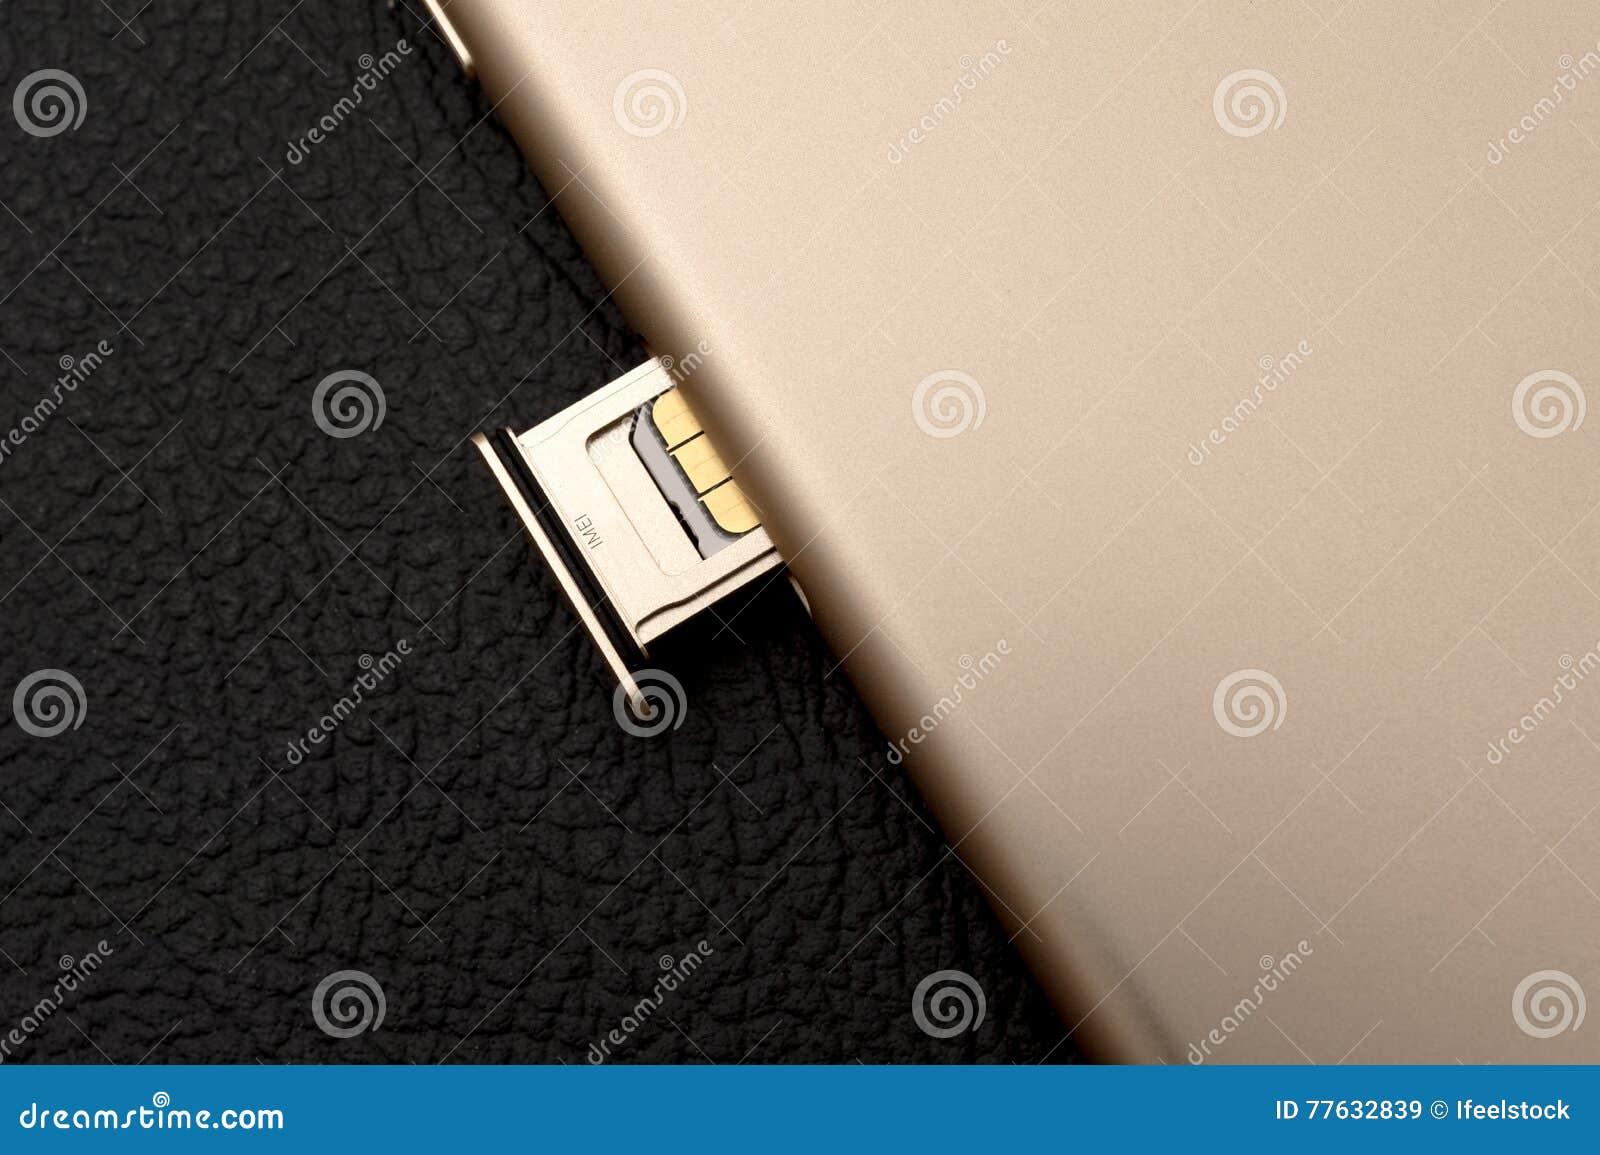 IPhone 7 Plus Dual Camera Unboxing Inser SIM CARD Module Editorial